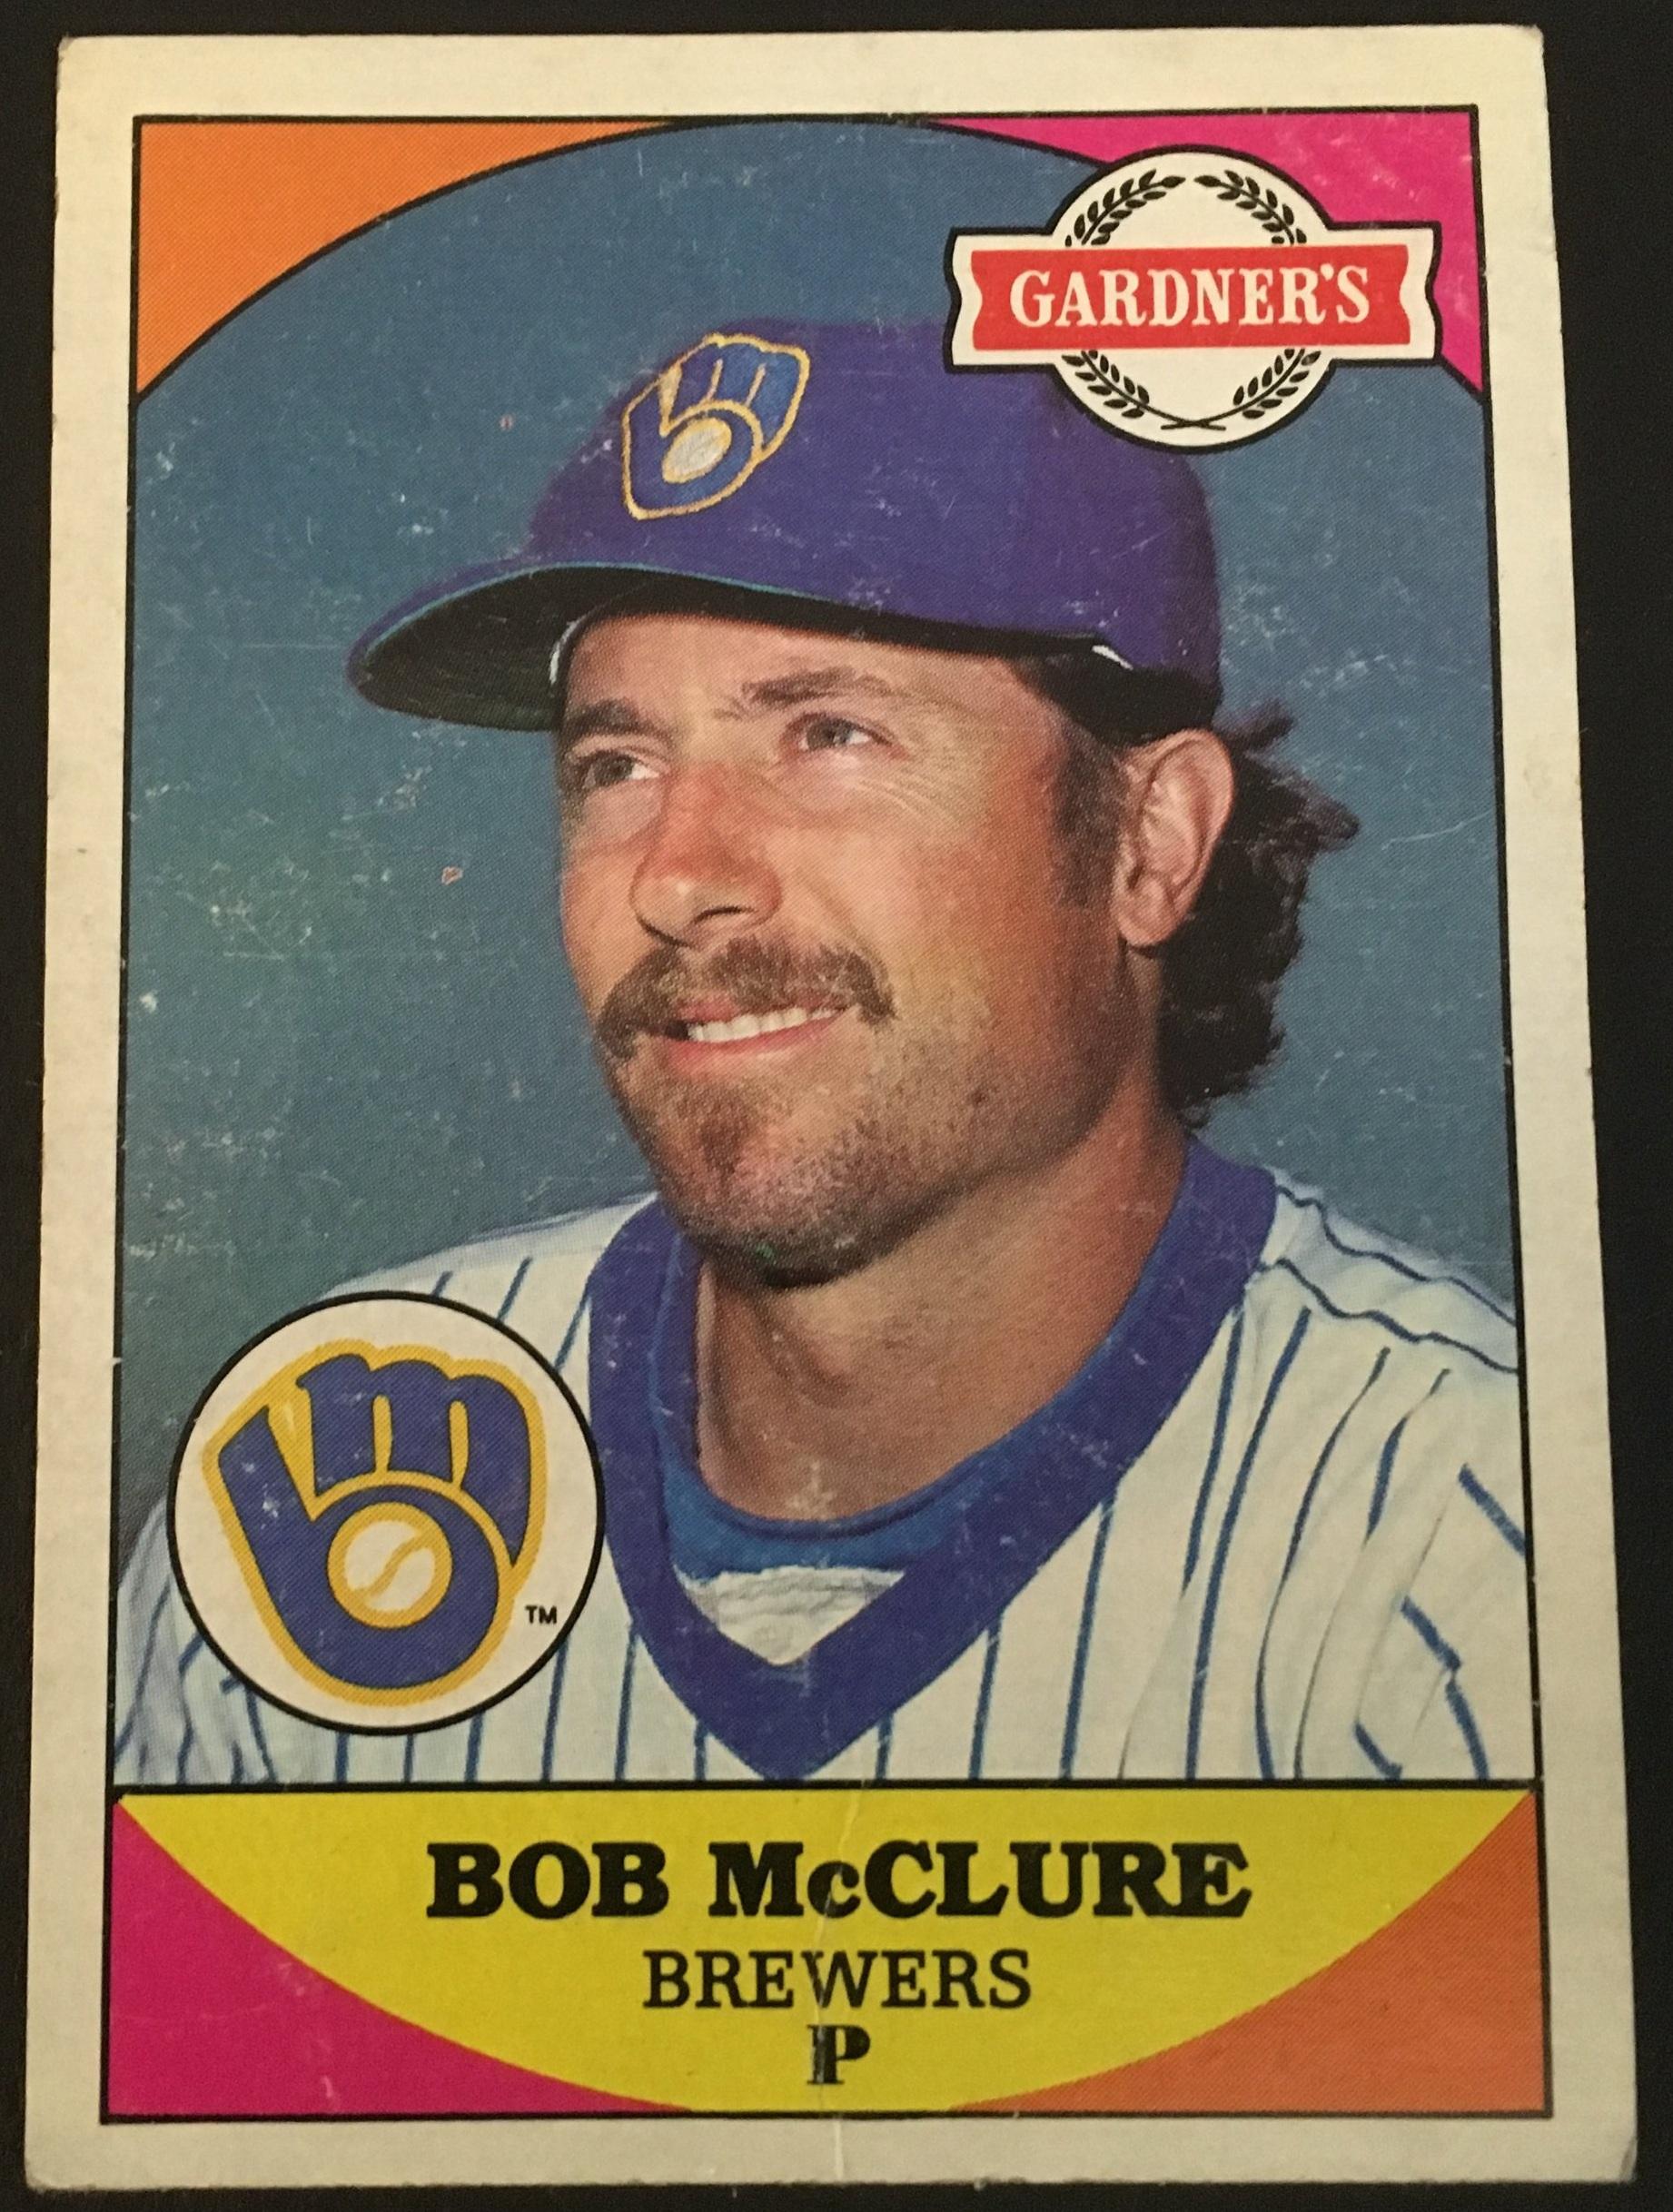 1983-Topps-Gardners-McClure.JPG